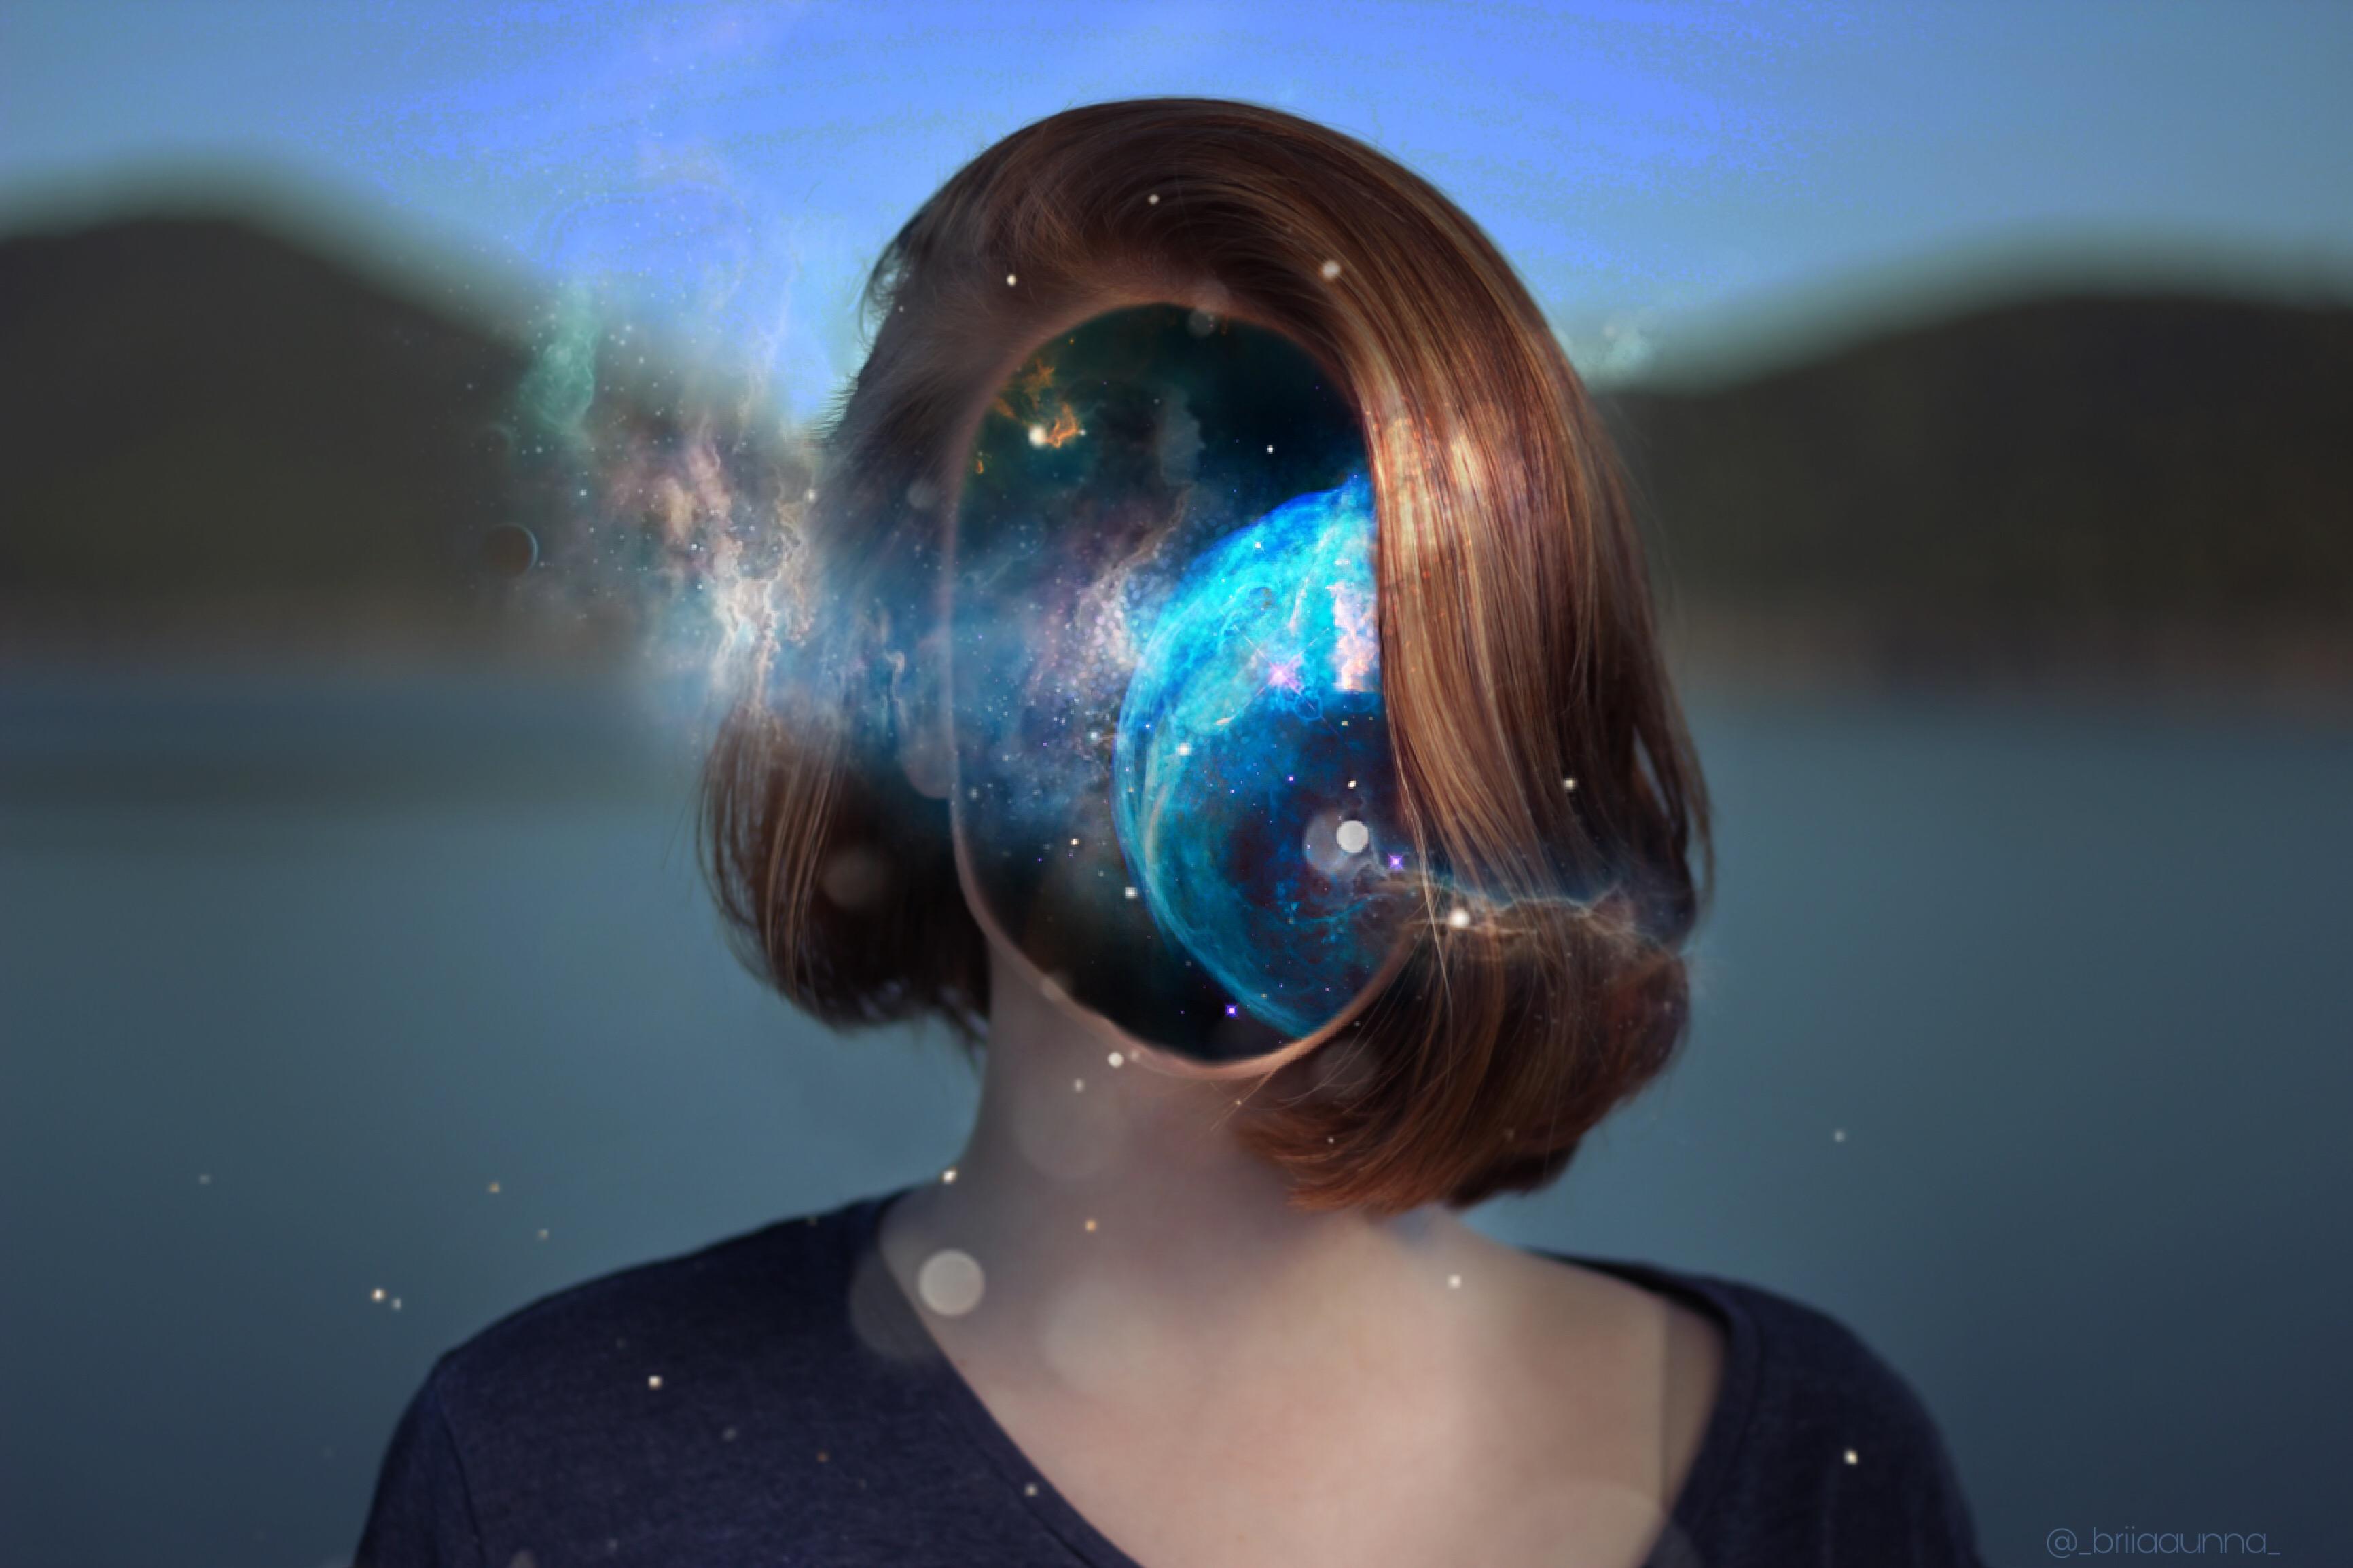 Unknown? #freetoedit #galaxy #madewithpicsart #editedbyme